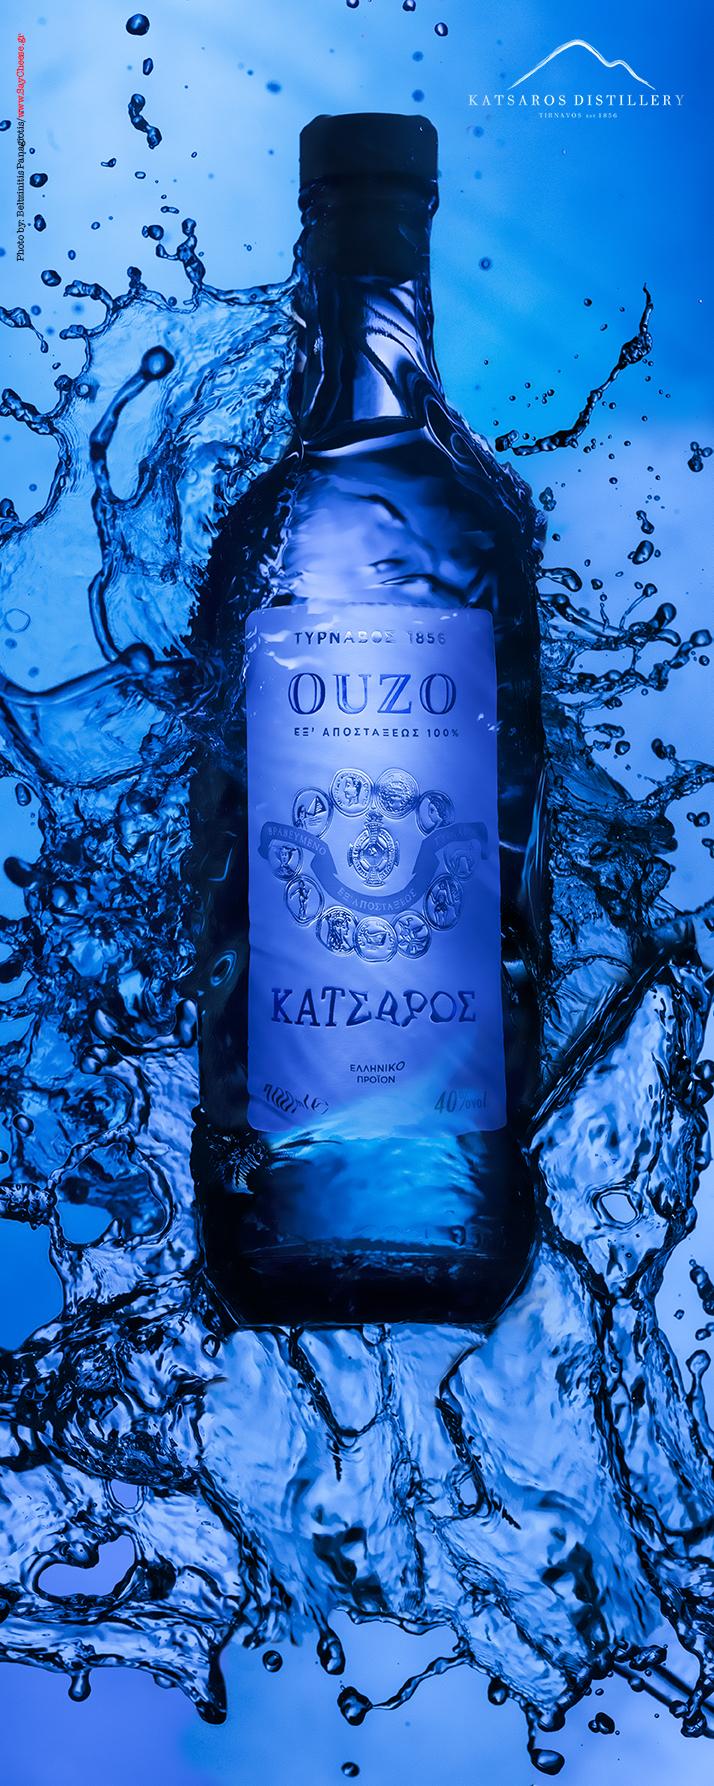 Katsaros Distillery Ouzo